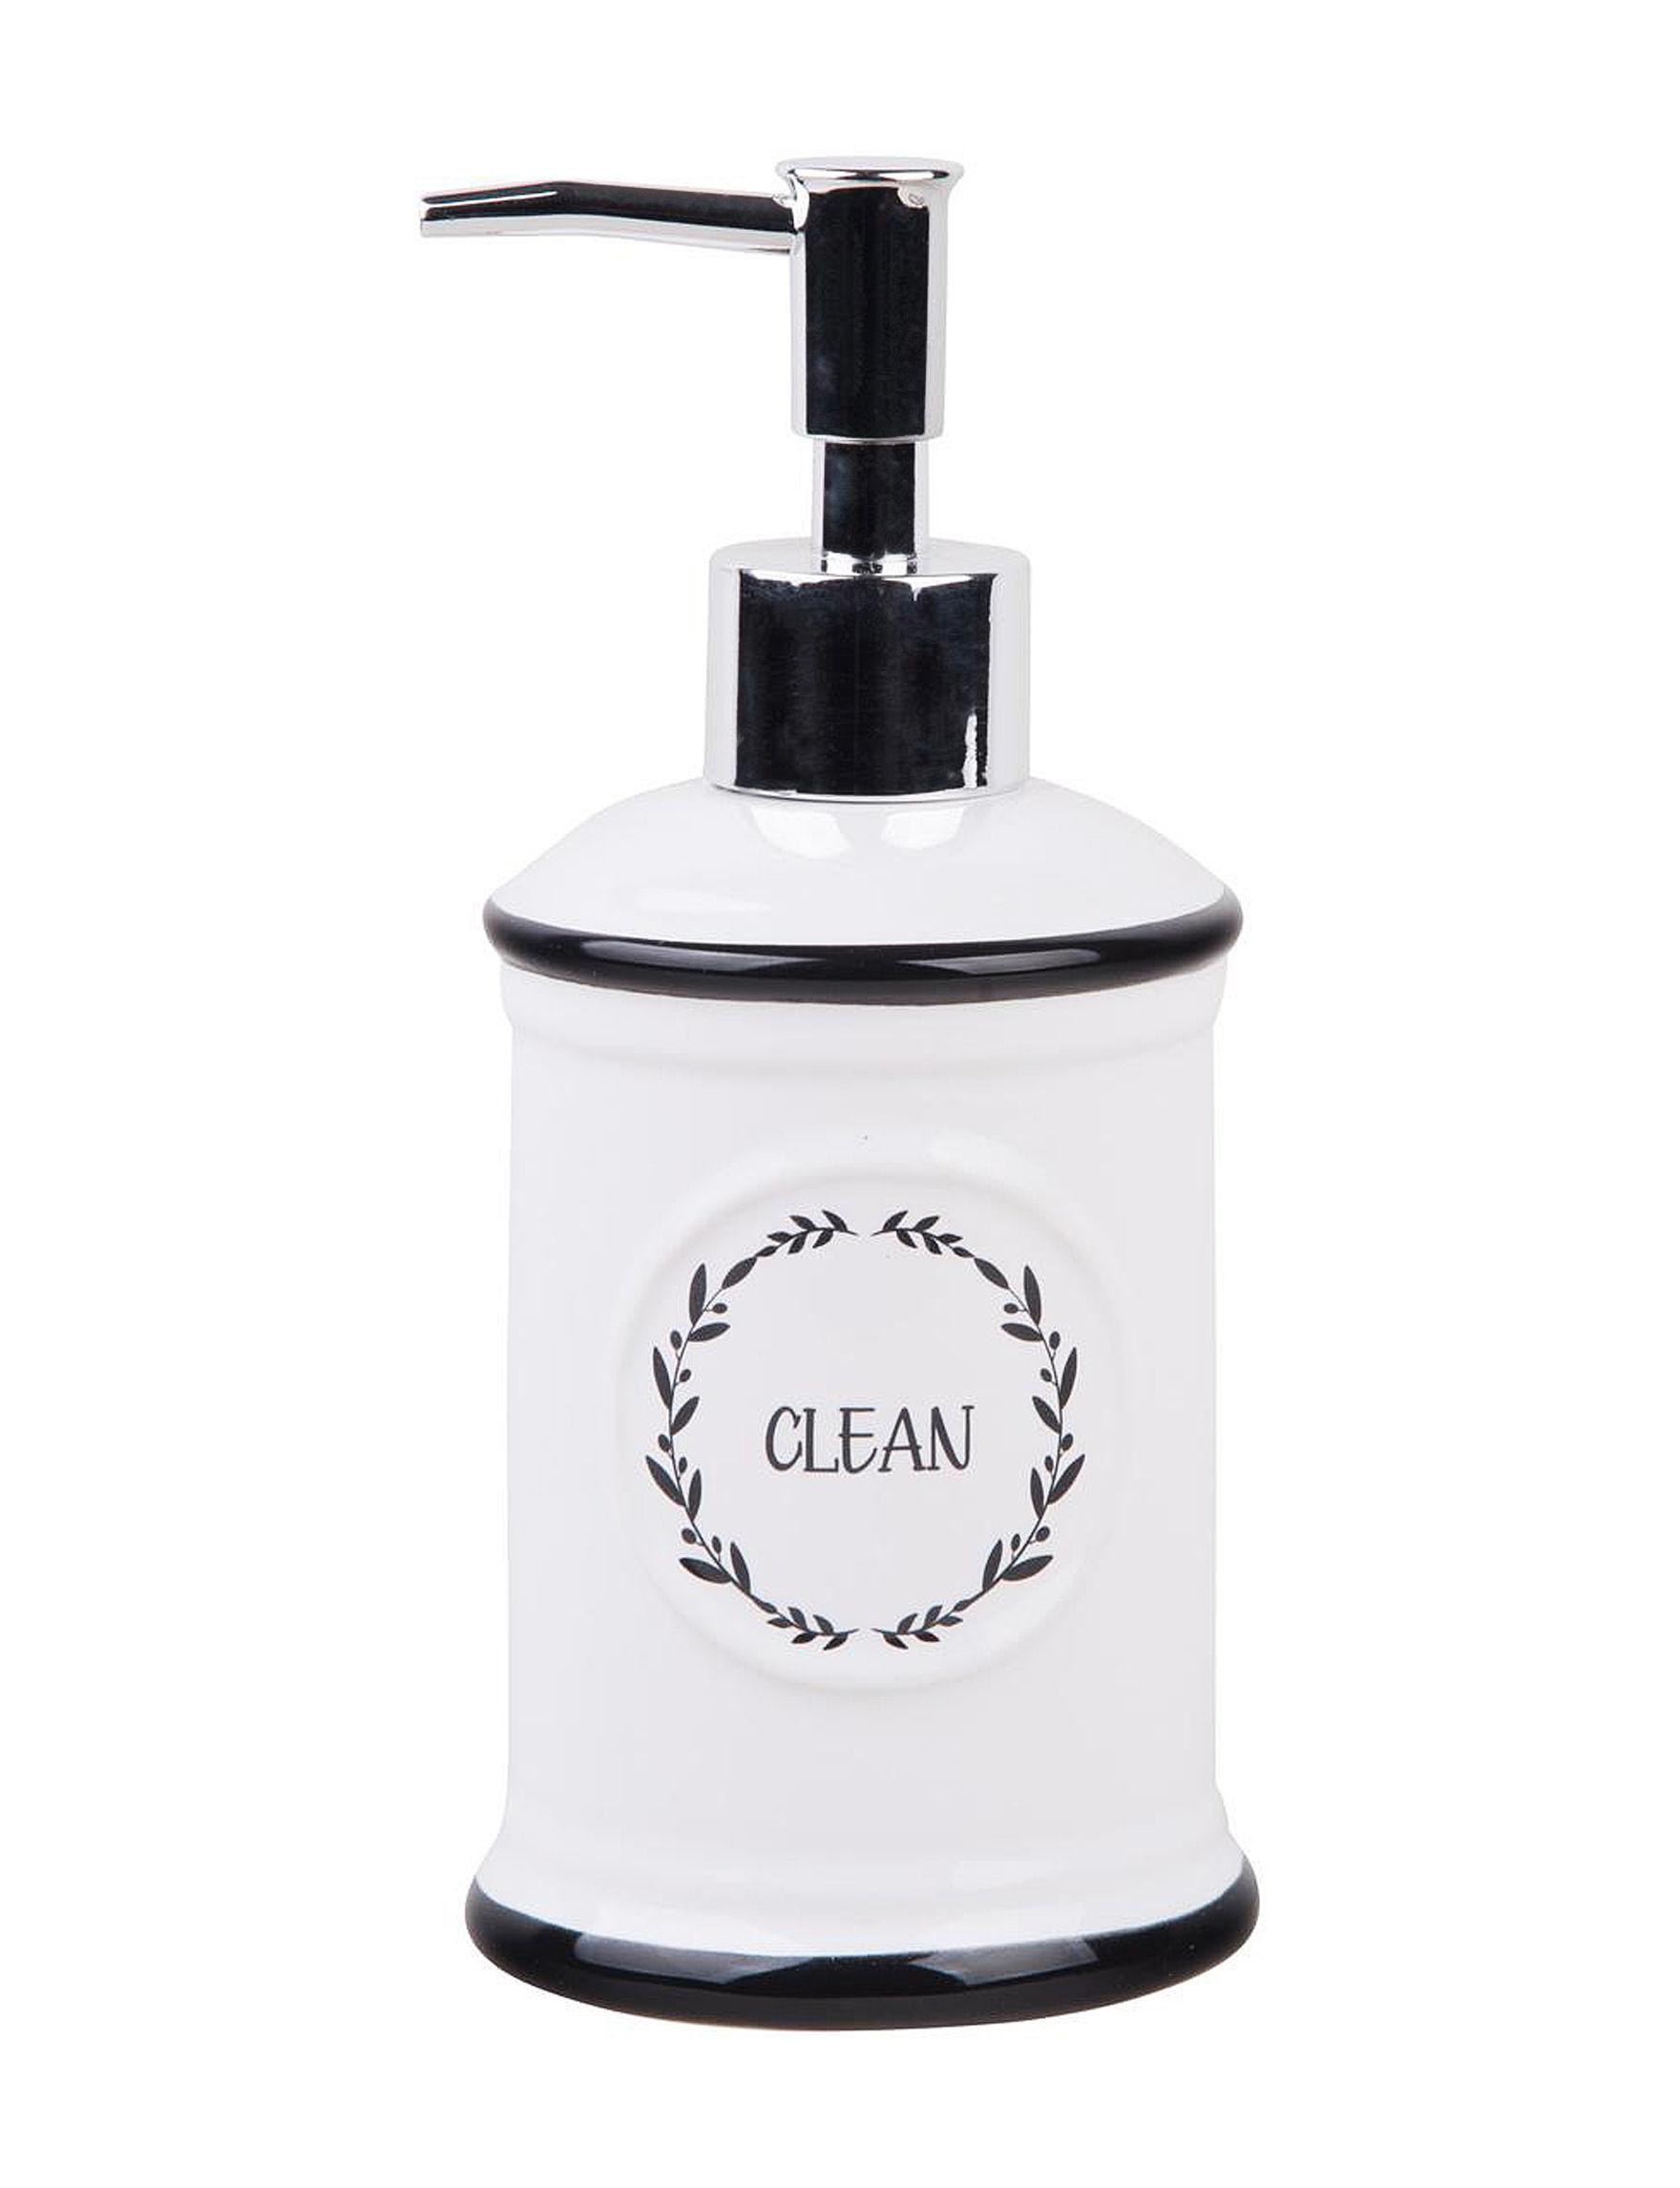 Home Essentials White / Black Soap & Lotion Dispensers Bath Accessories